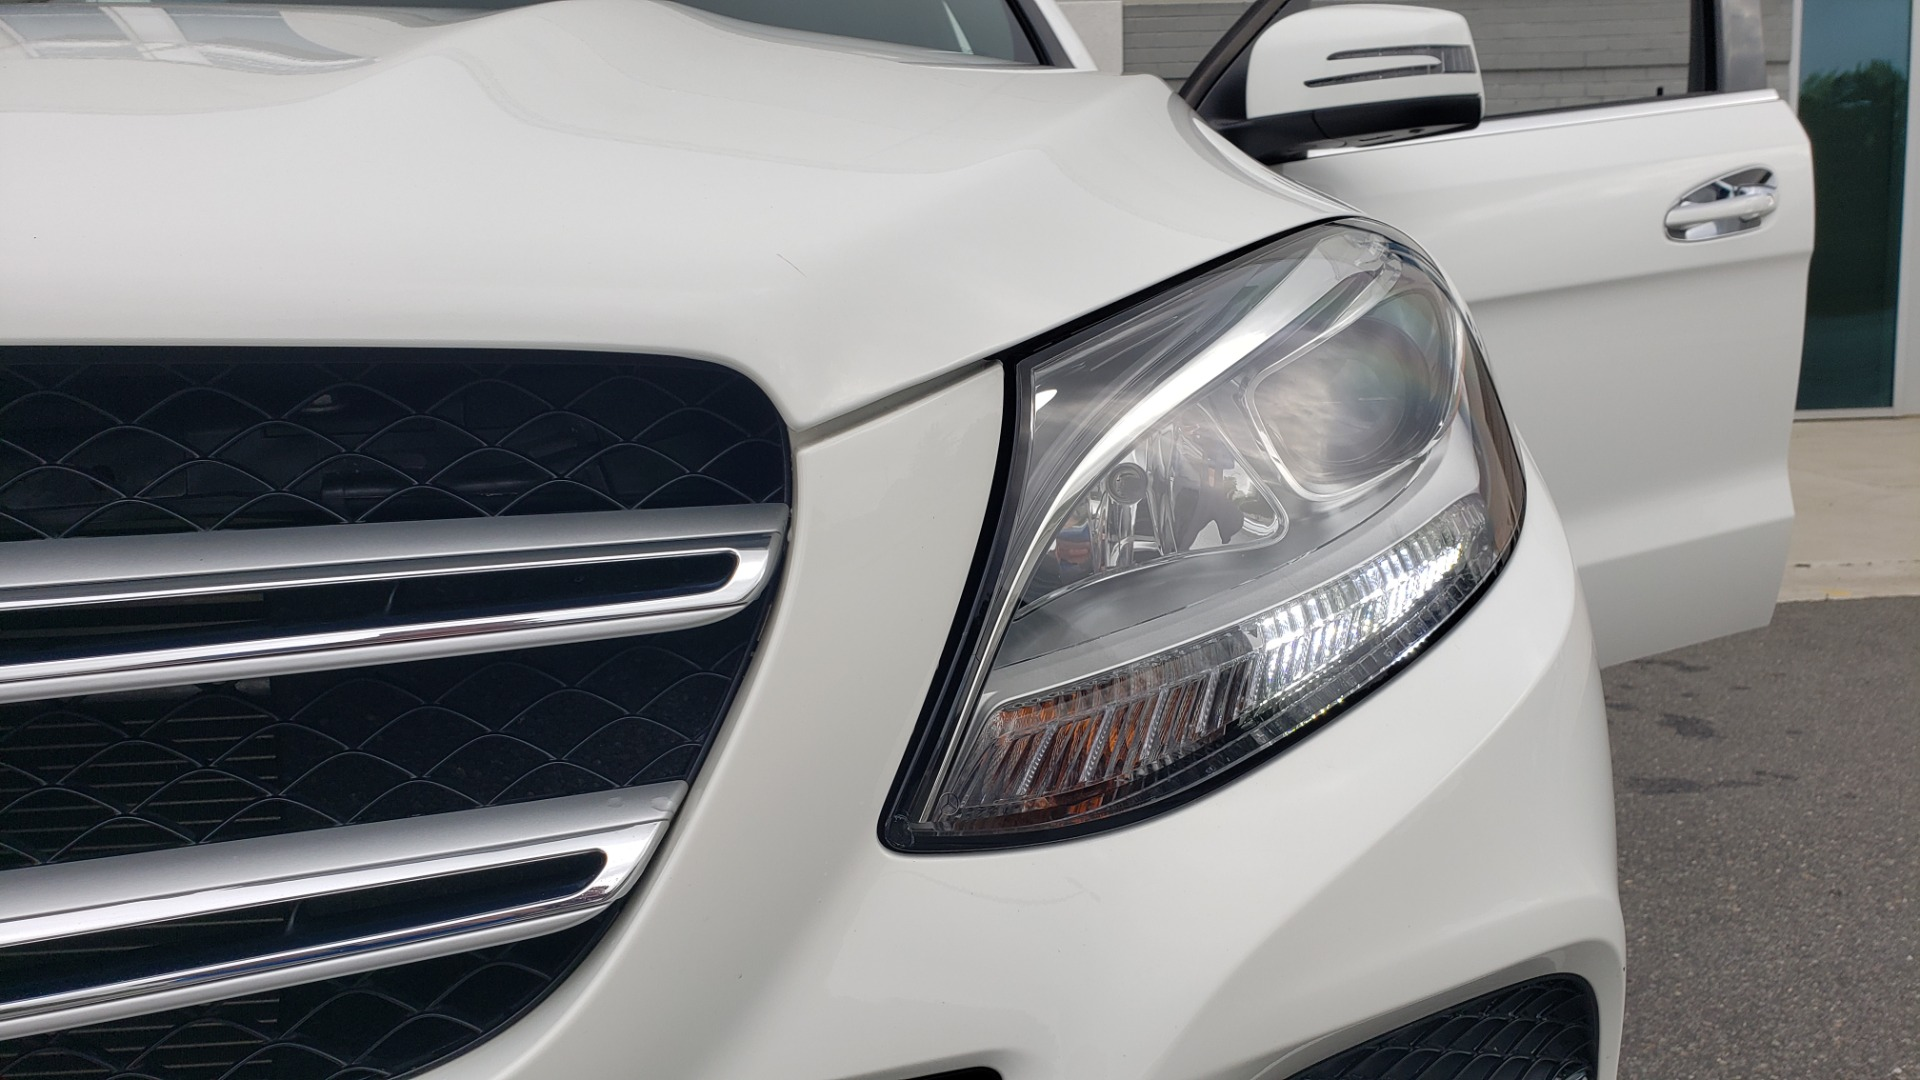 Used 2018 Mercedes-Benz GLE 350 4MATIC / PREM PKG / NAV / PARK ASST / K/H SND / HITCH / REARVIEW for sale $40,801 at Formula Imports in Charlotte NC 28227 25